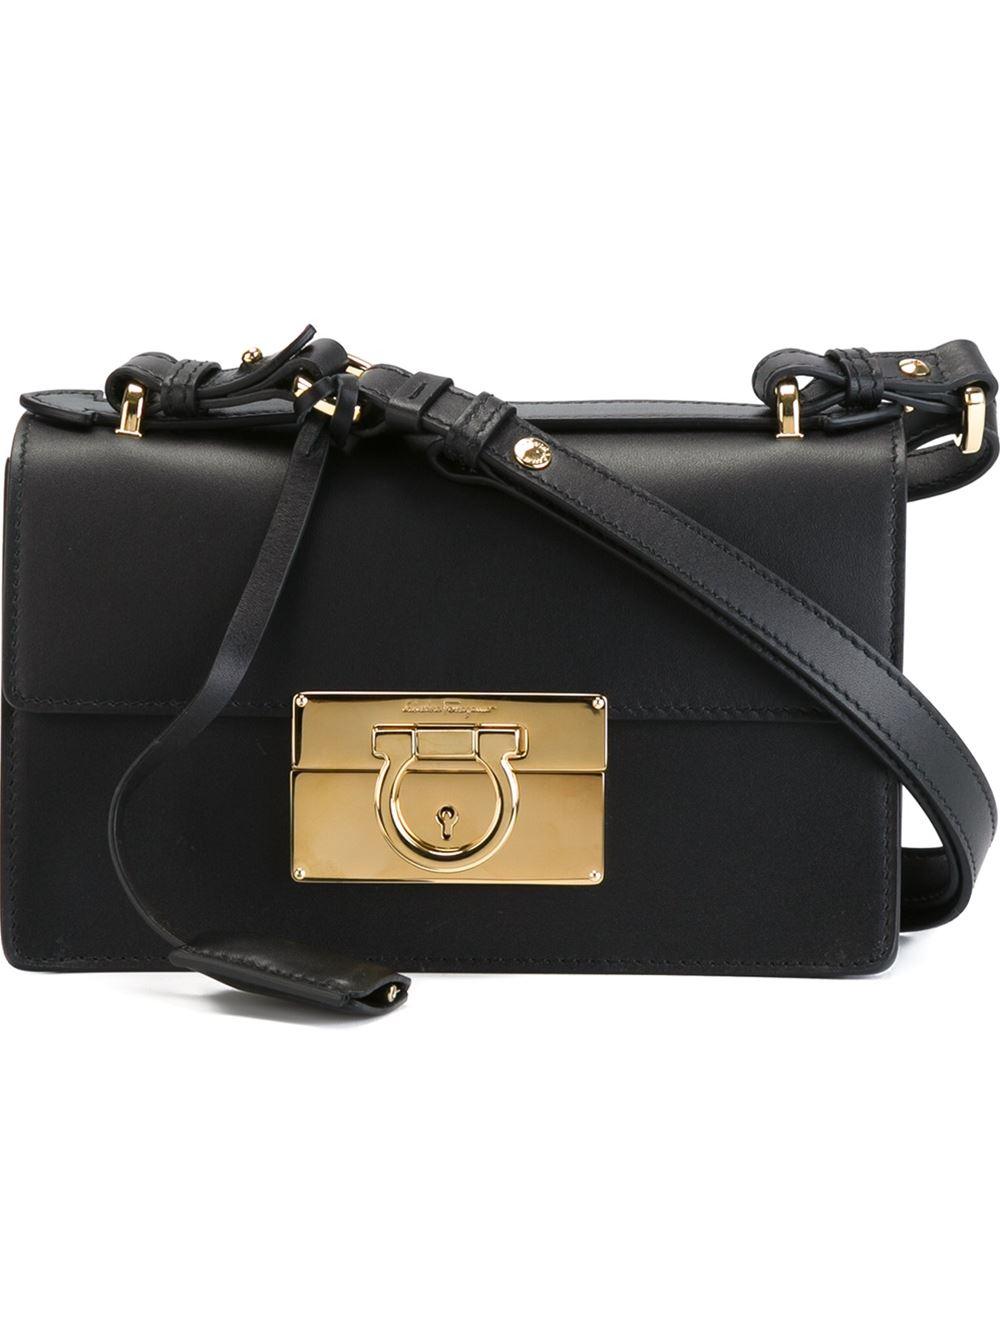 33e8c5950000 ... new style 0fd9d 6a8cf Ferragamo aileen Shoulder Bag in Black - Lyst ...